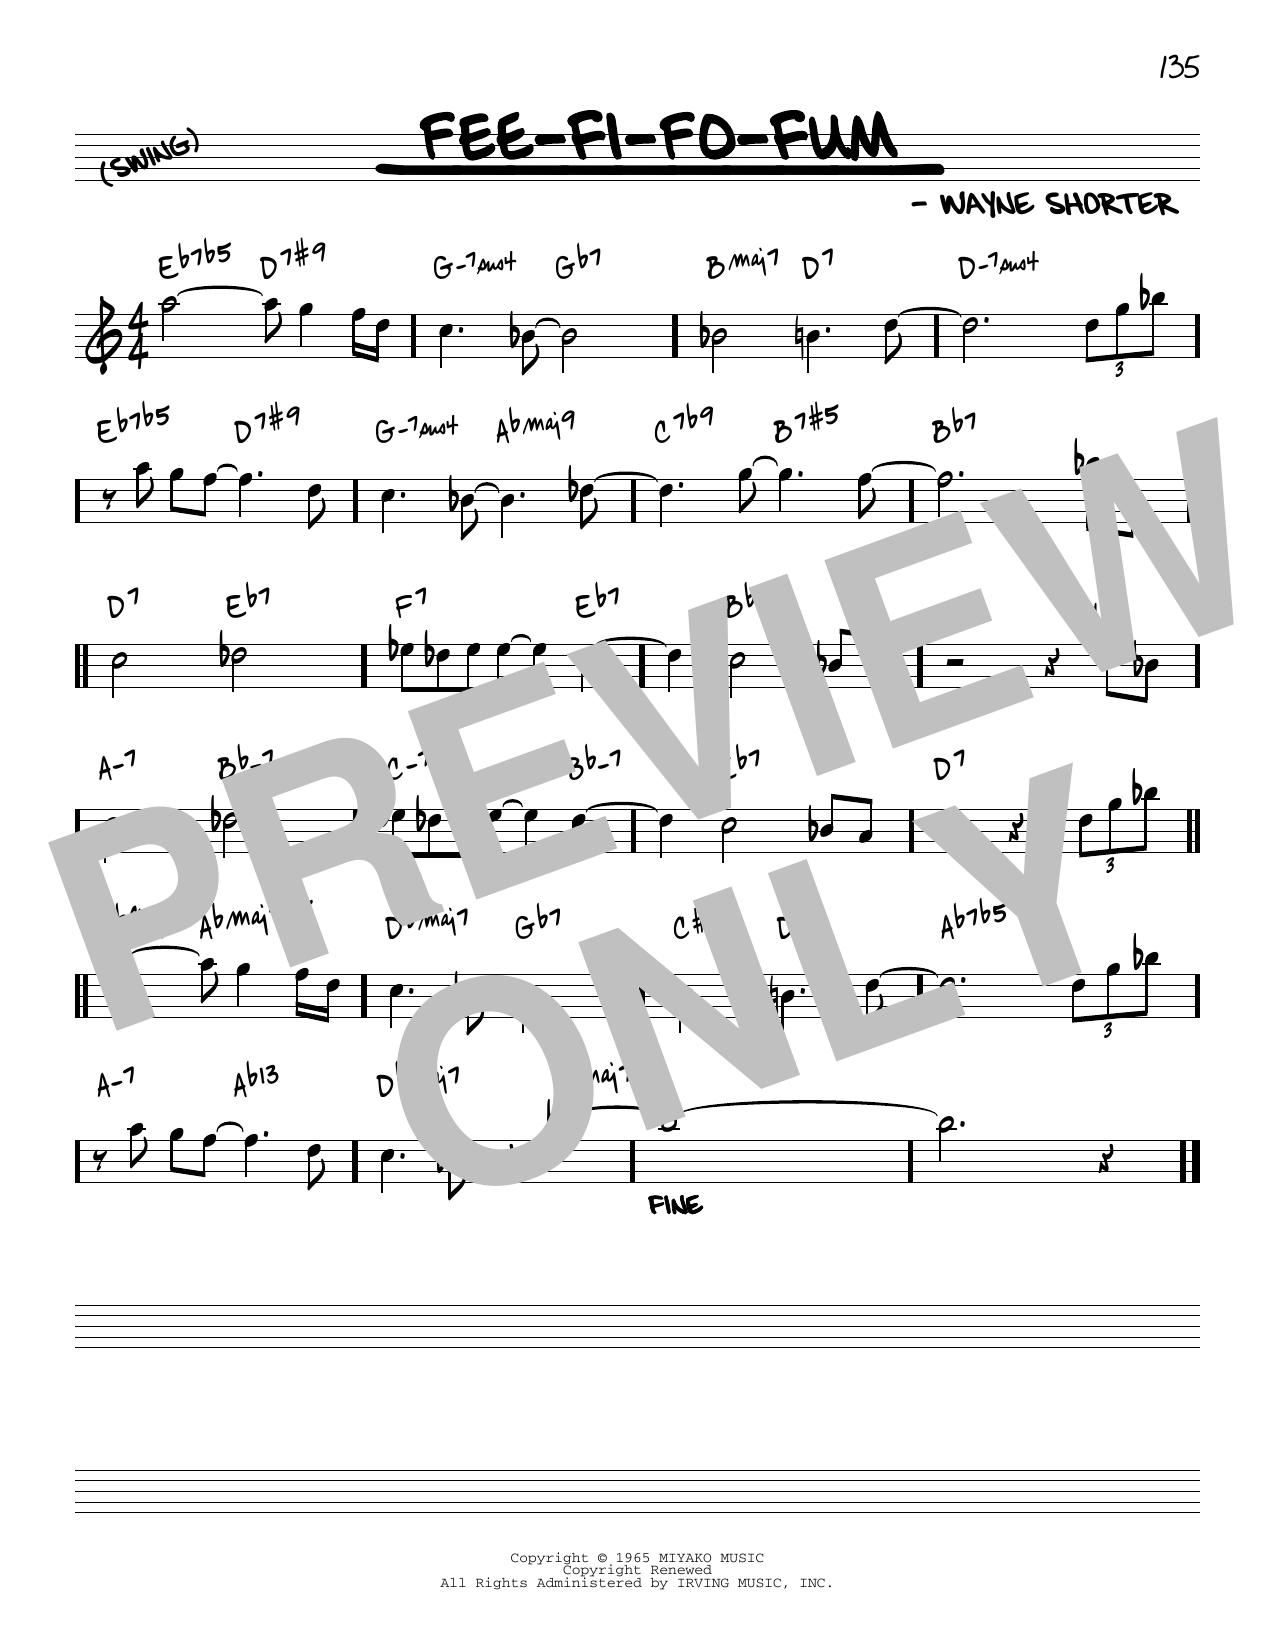 Wayne Shorter Fee-Fi-Fo-Fum [Reharmonized version] (arr. Jack Grassel) sheet music notes printable PDF score